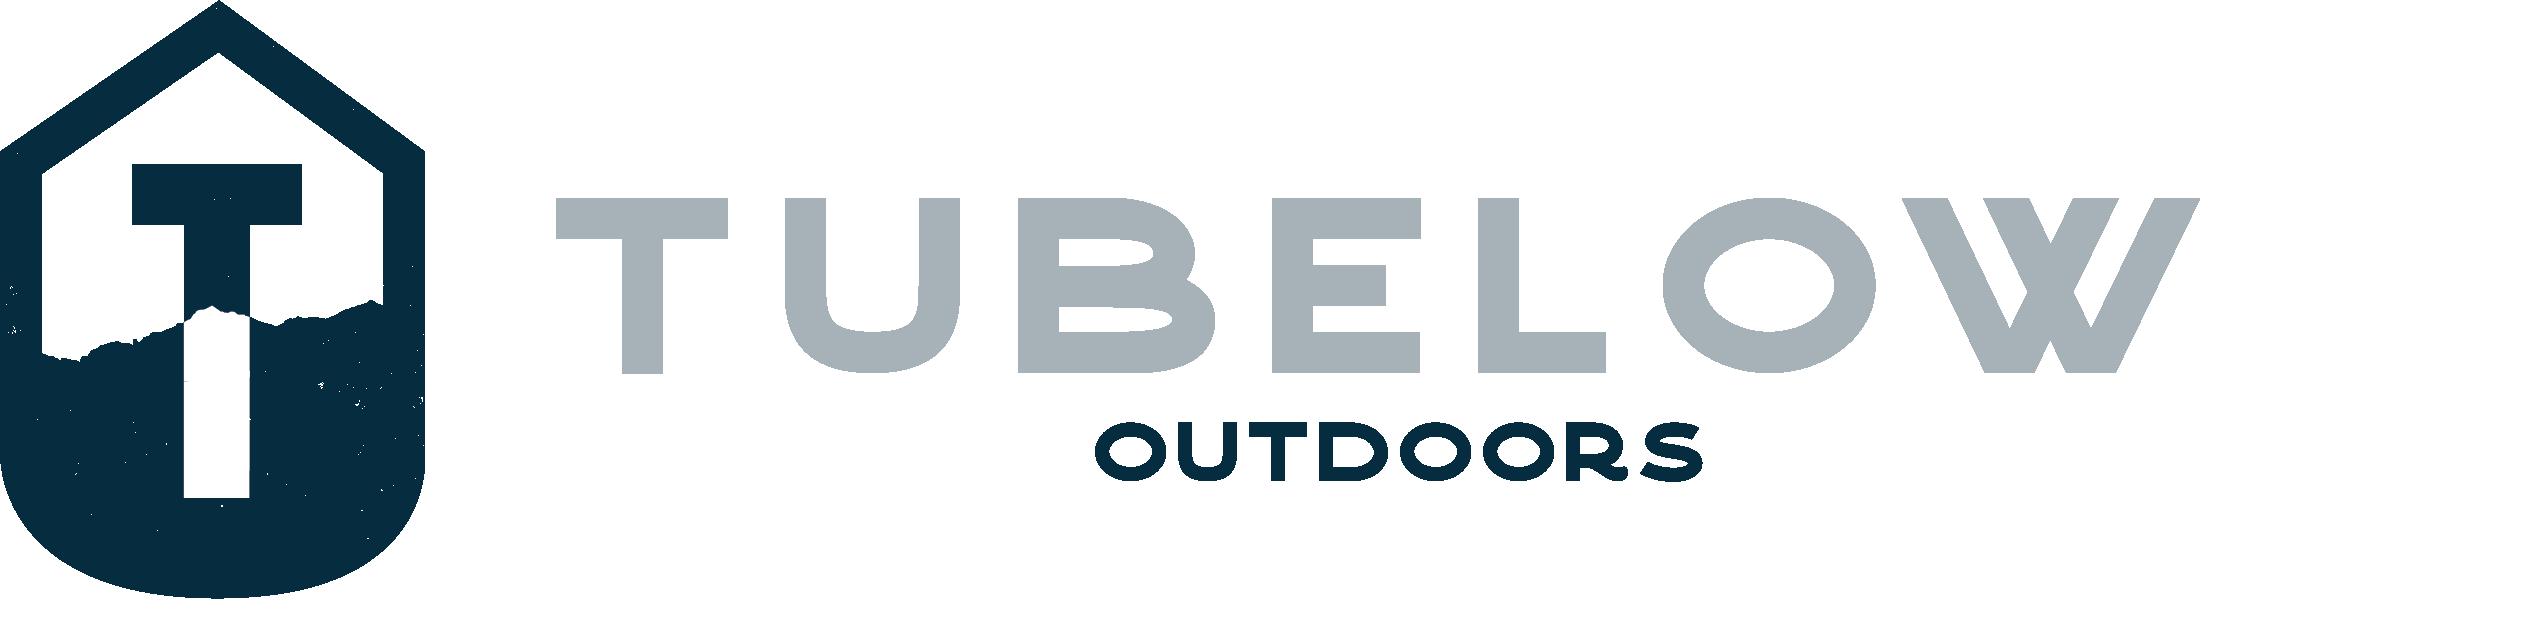 Tubelow Outdoors